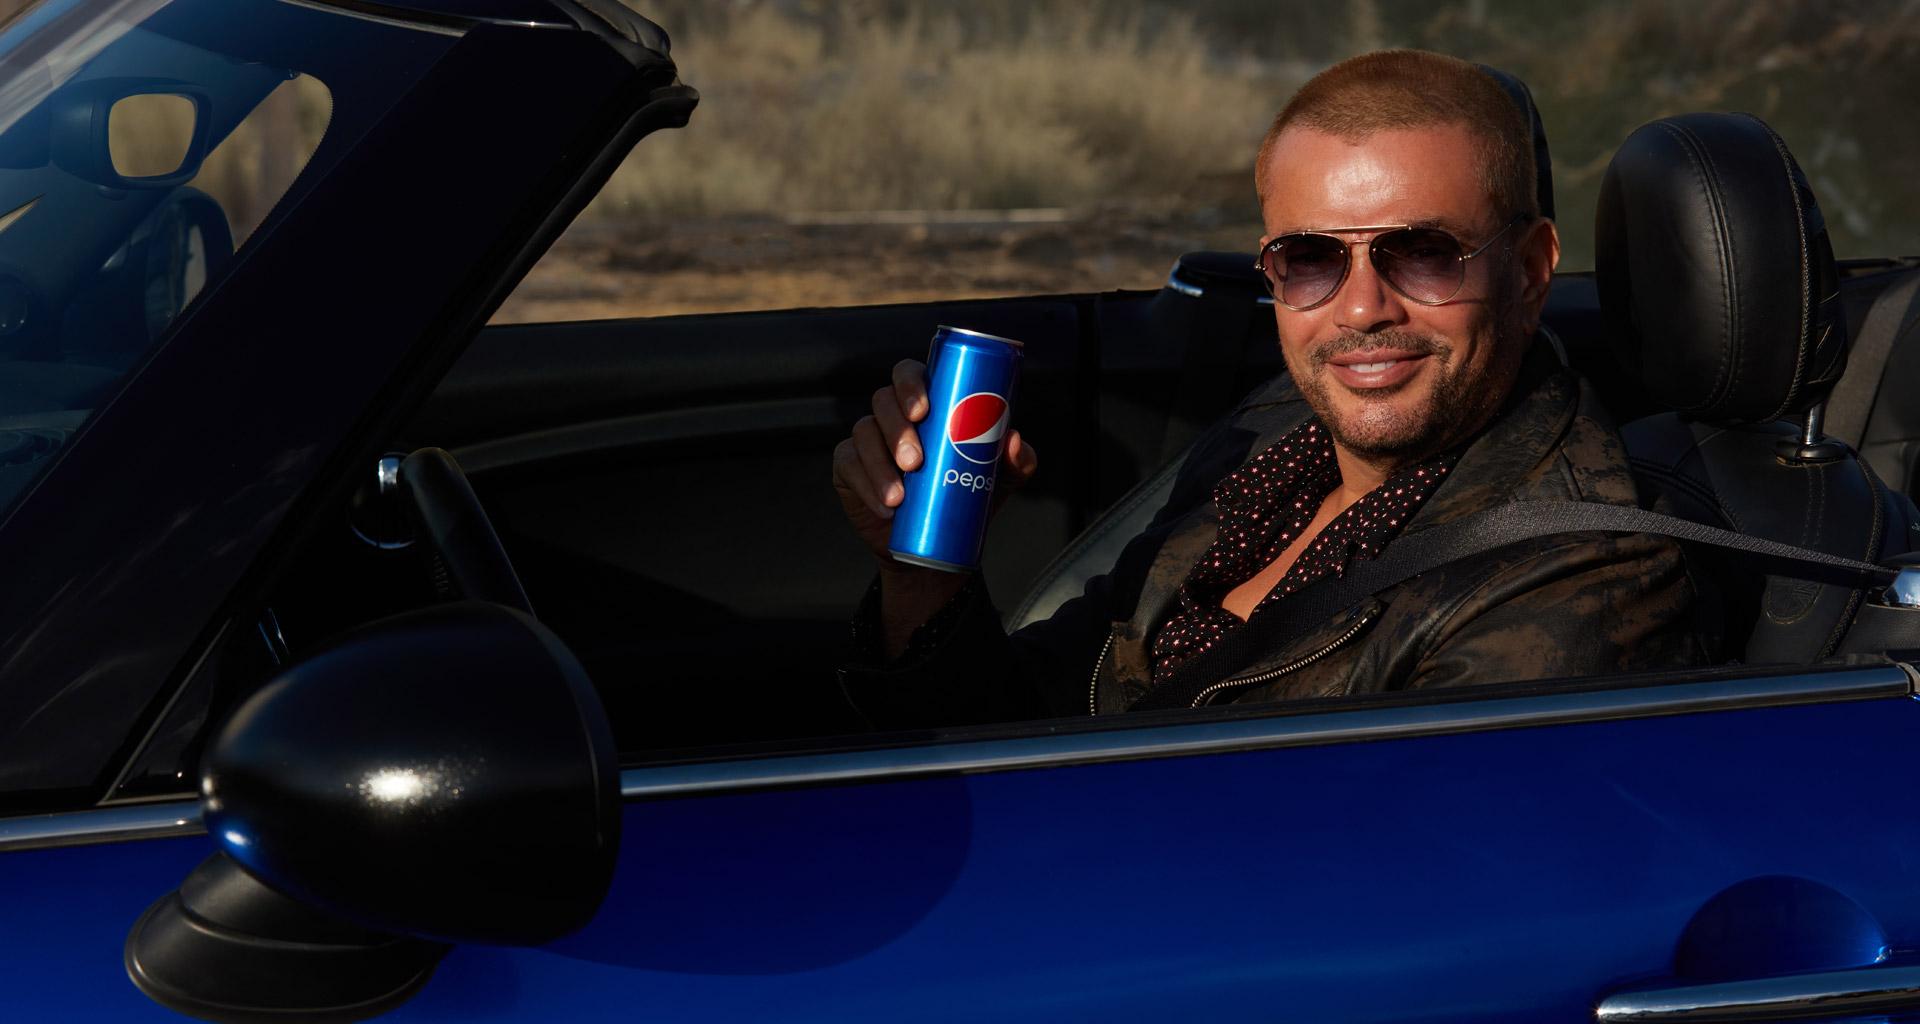 20 Years of Amr Diab and Pepsi